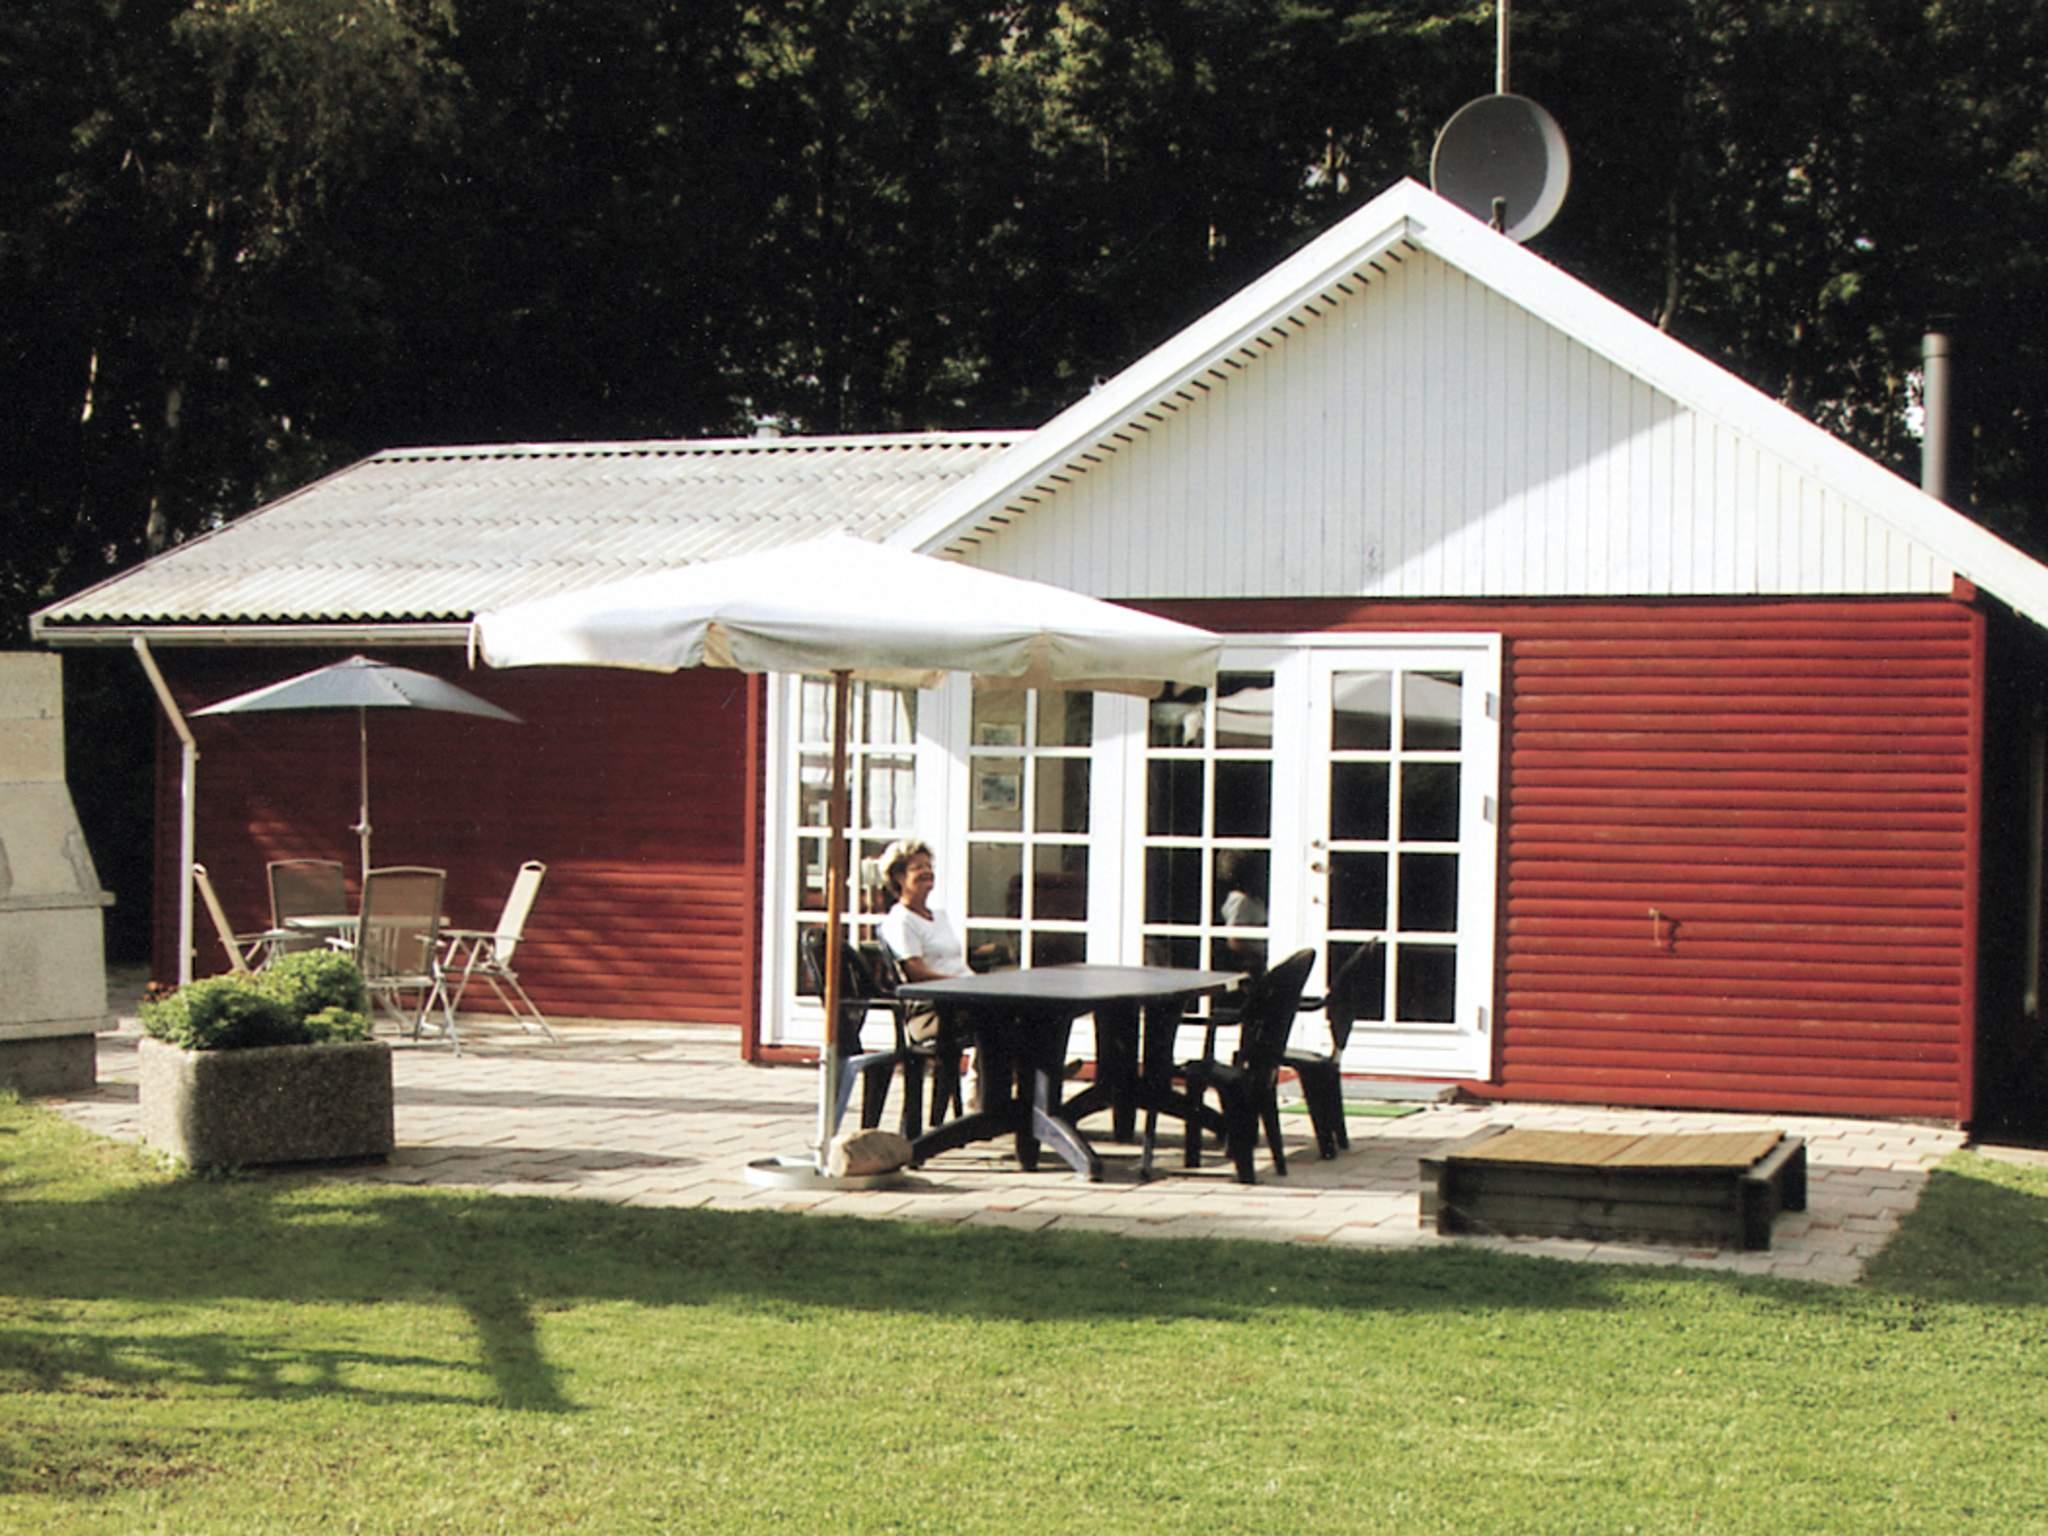 Ferienhaus Skovmose/Als (82561), Skovby, , Südostjütland, Dänemark, Bild 15